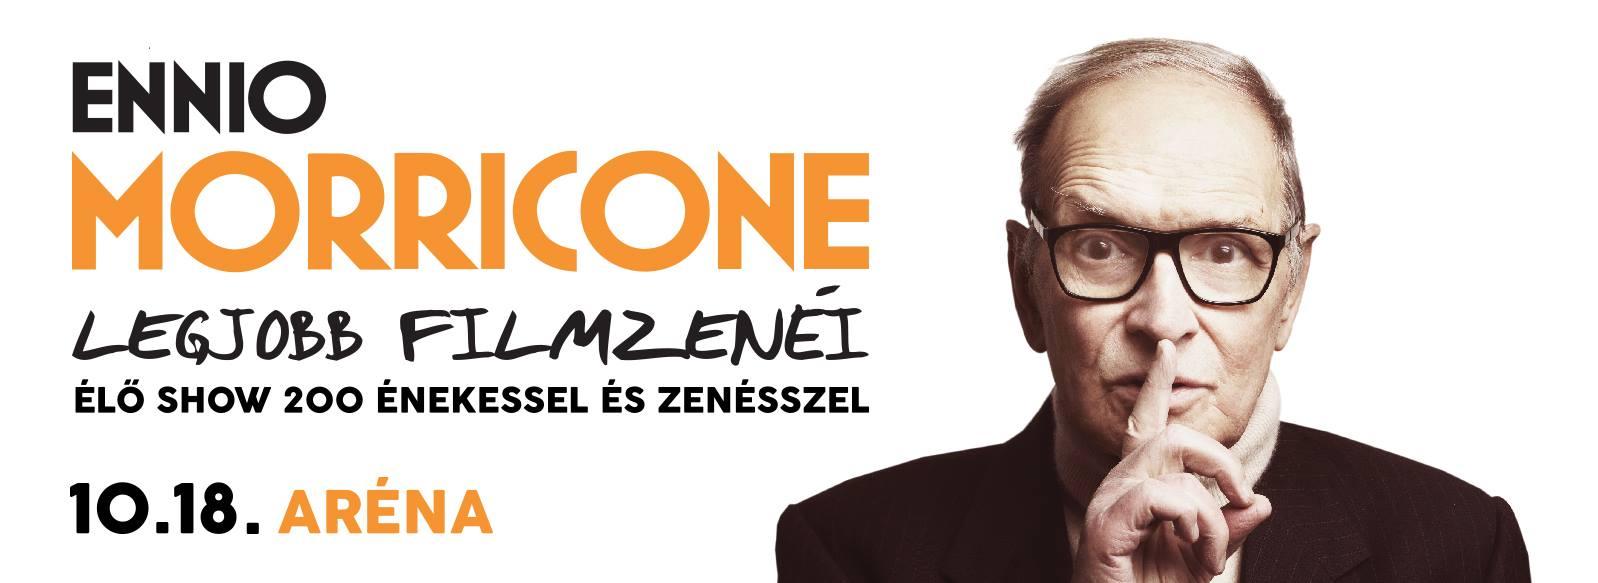 Ennio Morricone koncert 2017